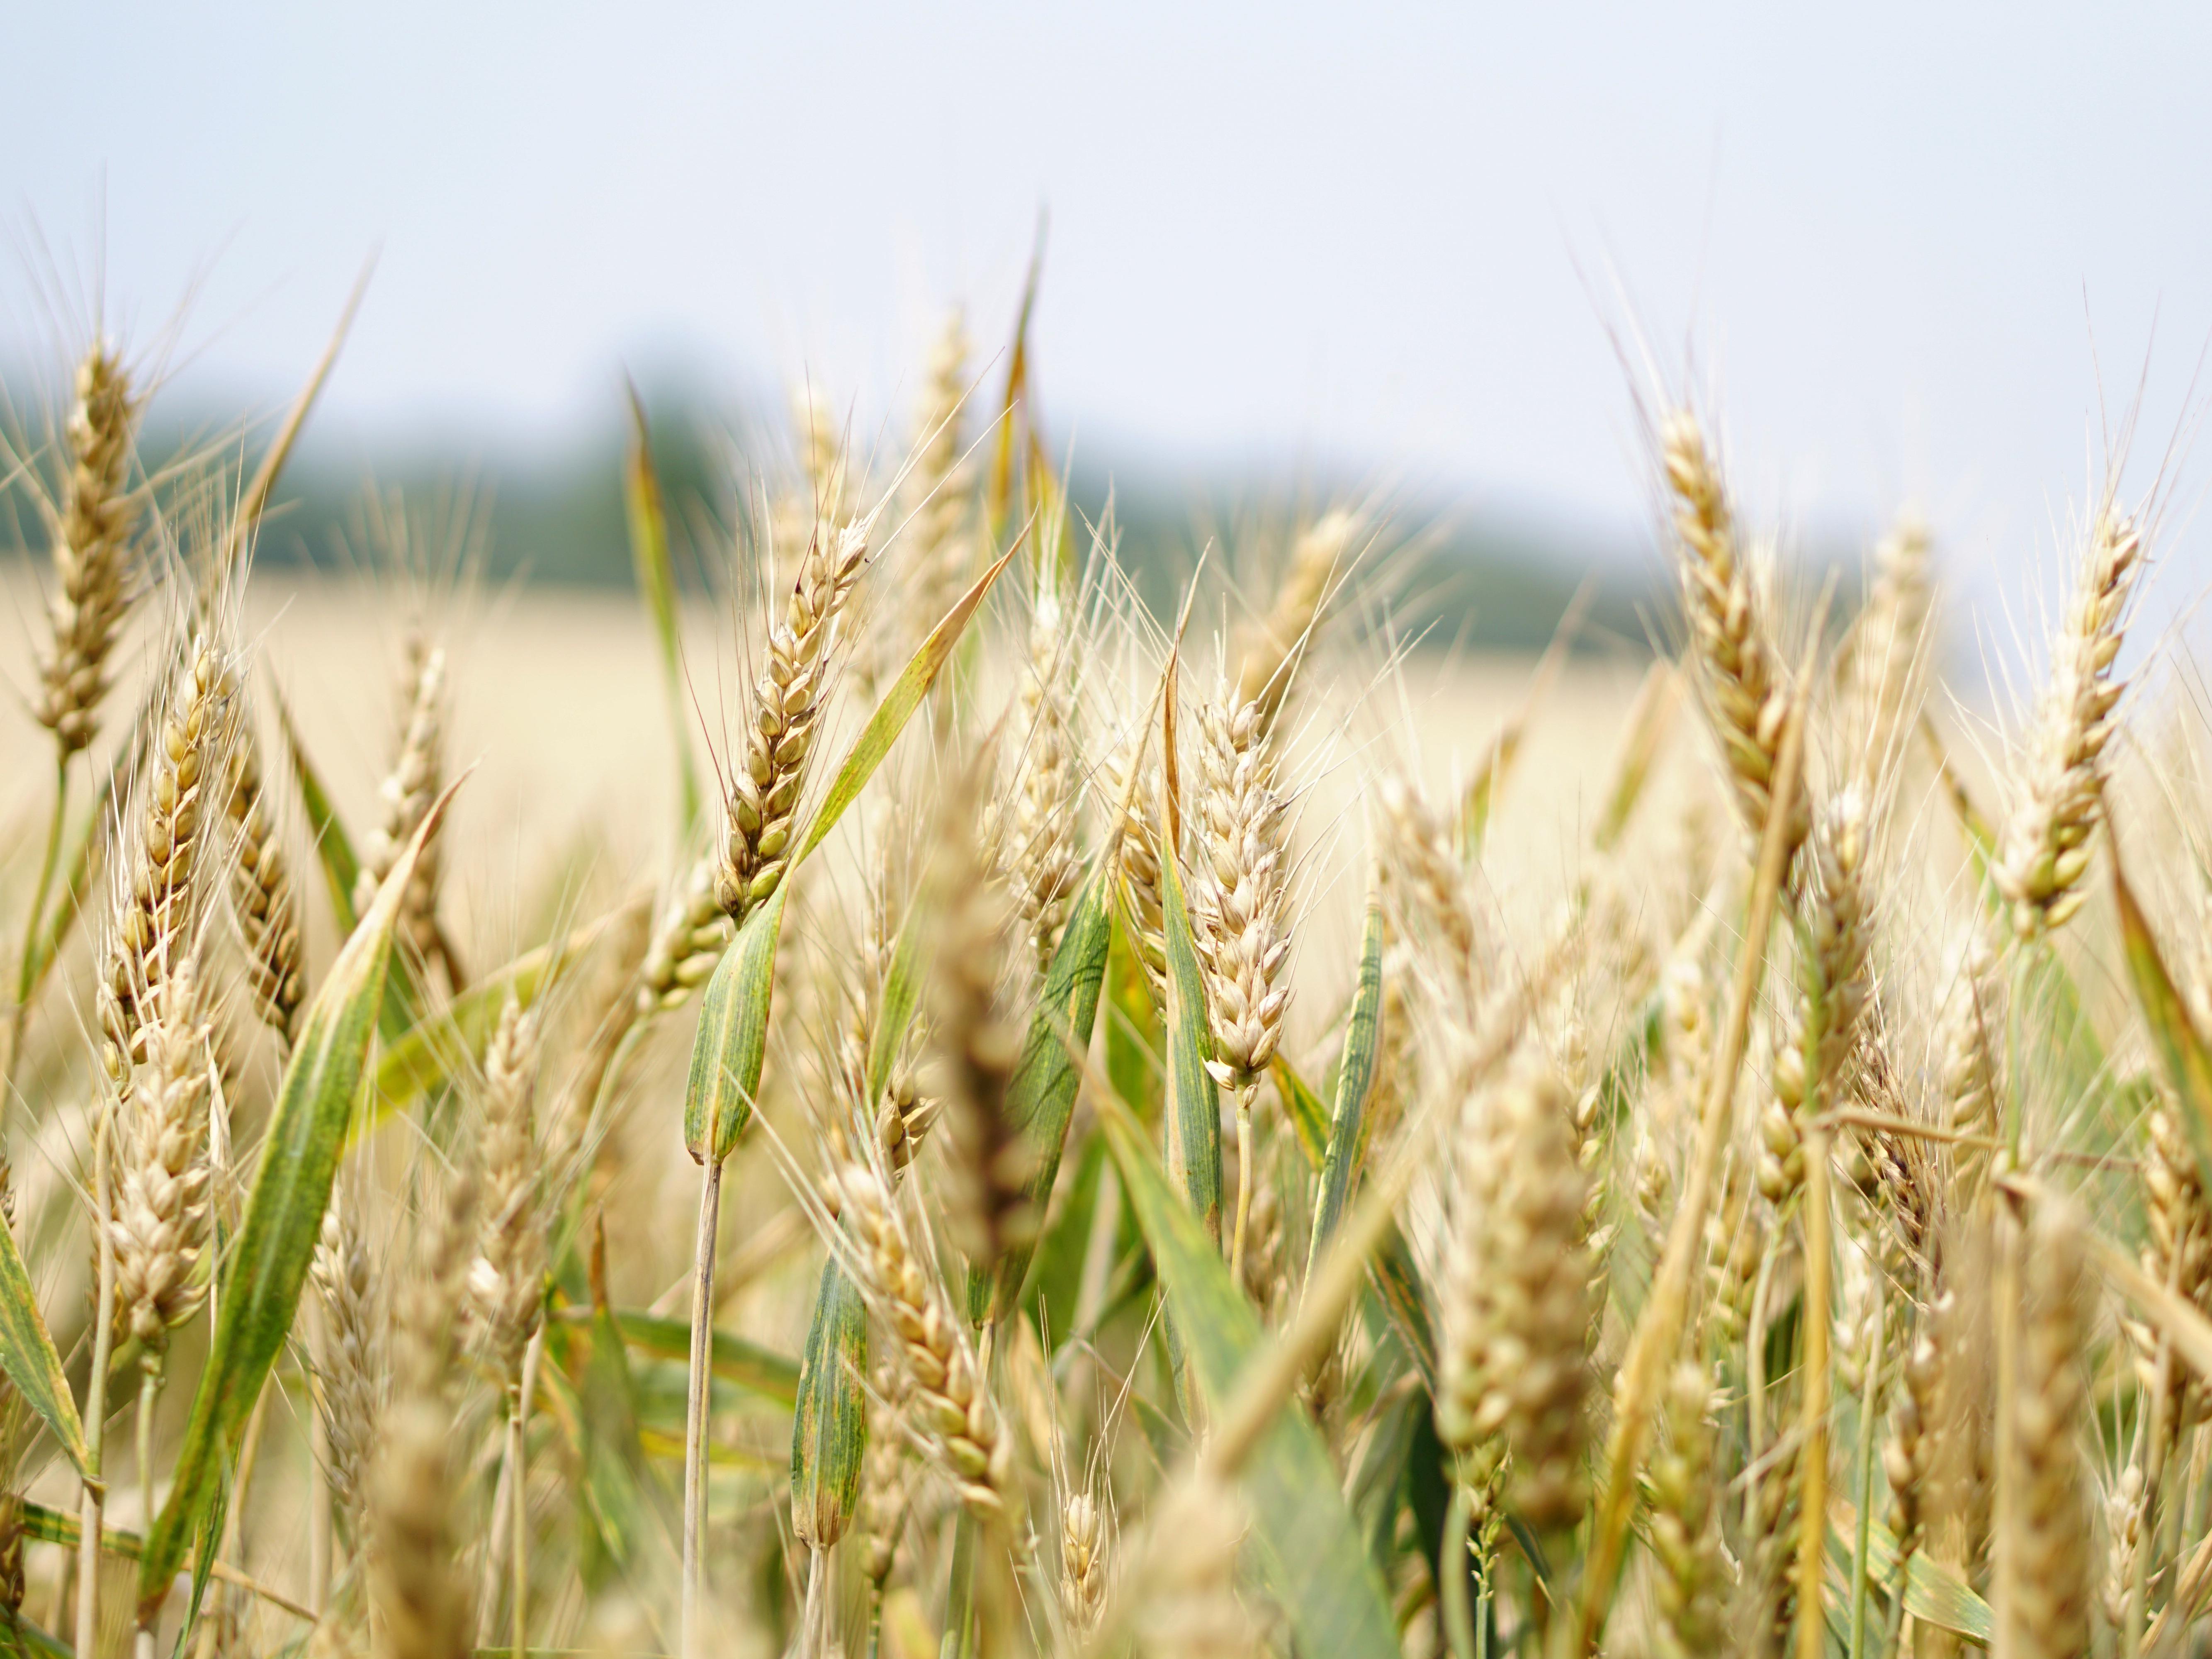 Countries Rush to Hoard Food